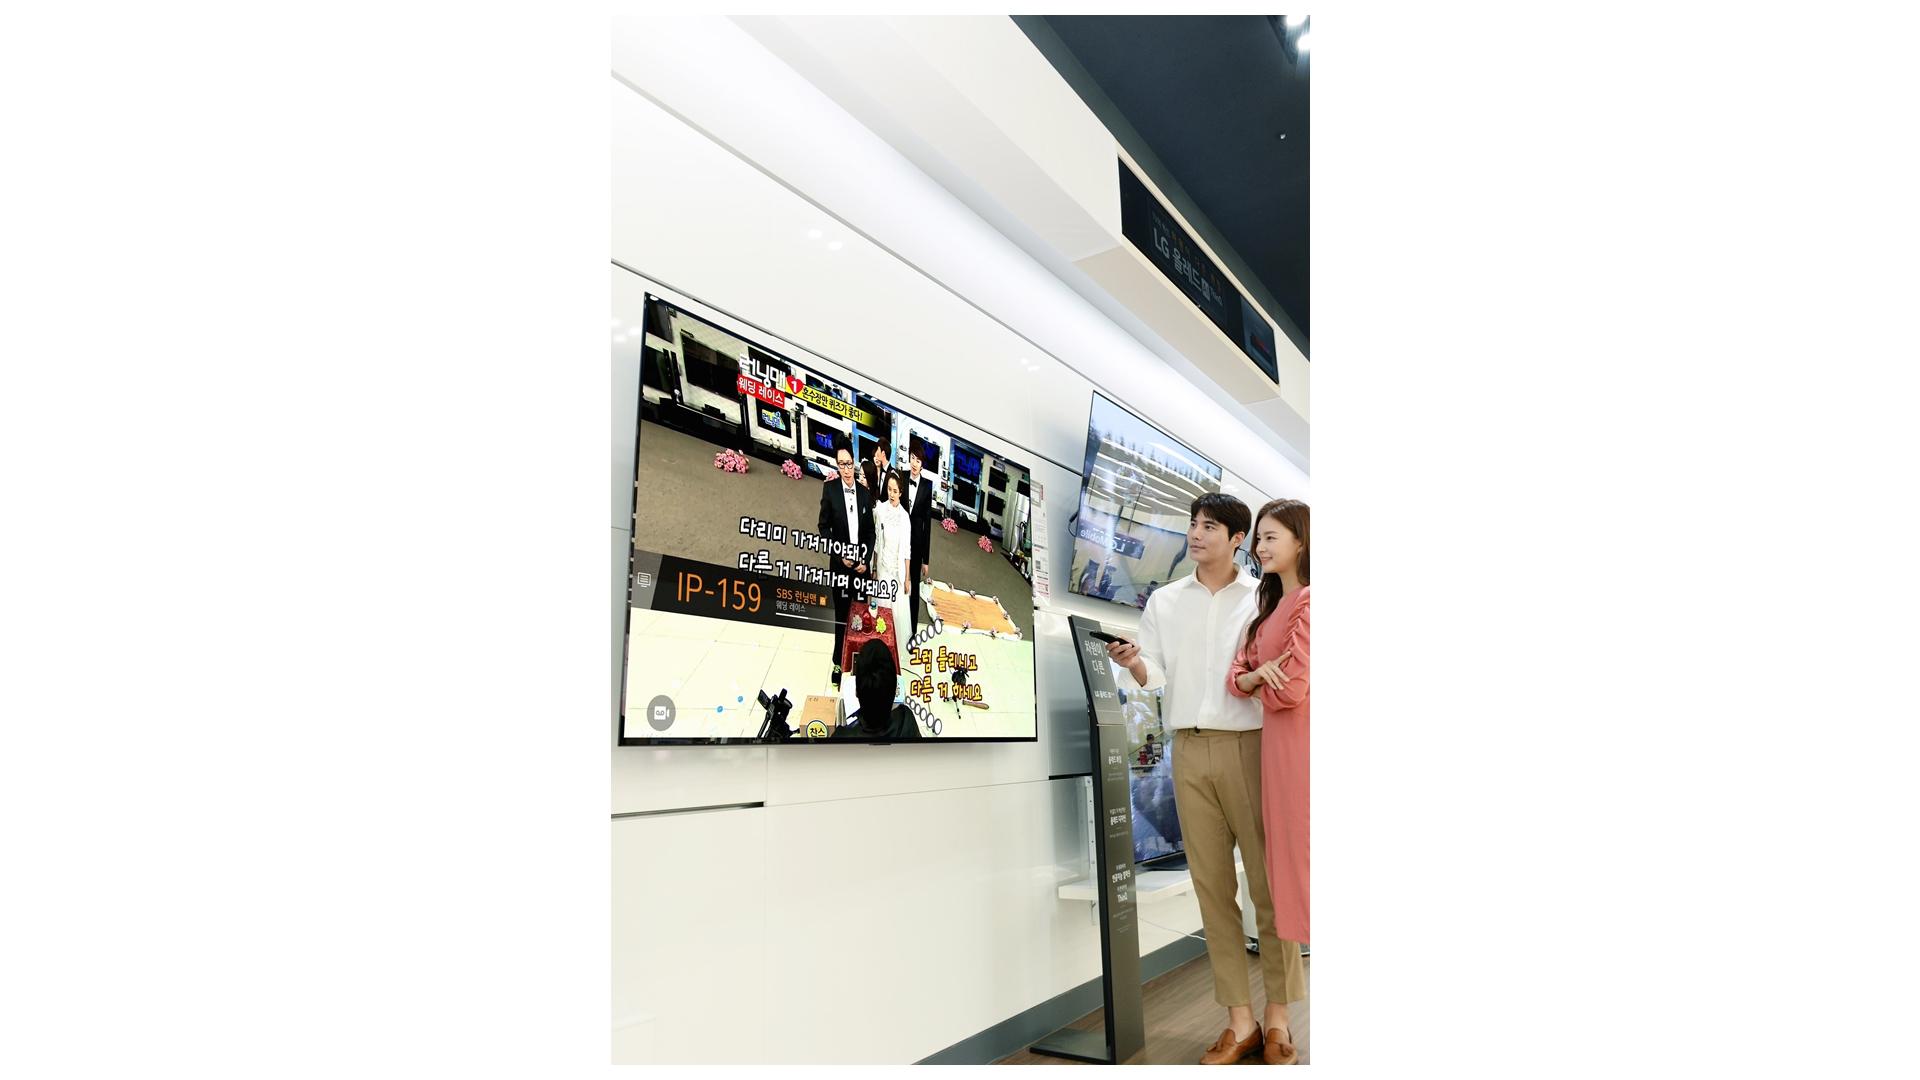 LG전자가 인터넷이 연결된 LG TV에서 고객이 다양한 콘텐츠를 무료로 시청할 수 있는 LG 채널 서비스를 대폭 확대한다. LG 채널이 국내에서 지원하는 채널 수는 총 112개이고 북미, 유럽, 중남미 등 해외 주요 시장에서도 서비스를 제공하고 있다. 모델들이 LG 채널을 소개하고 있다.